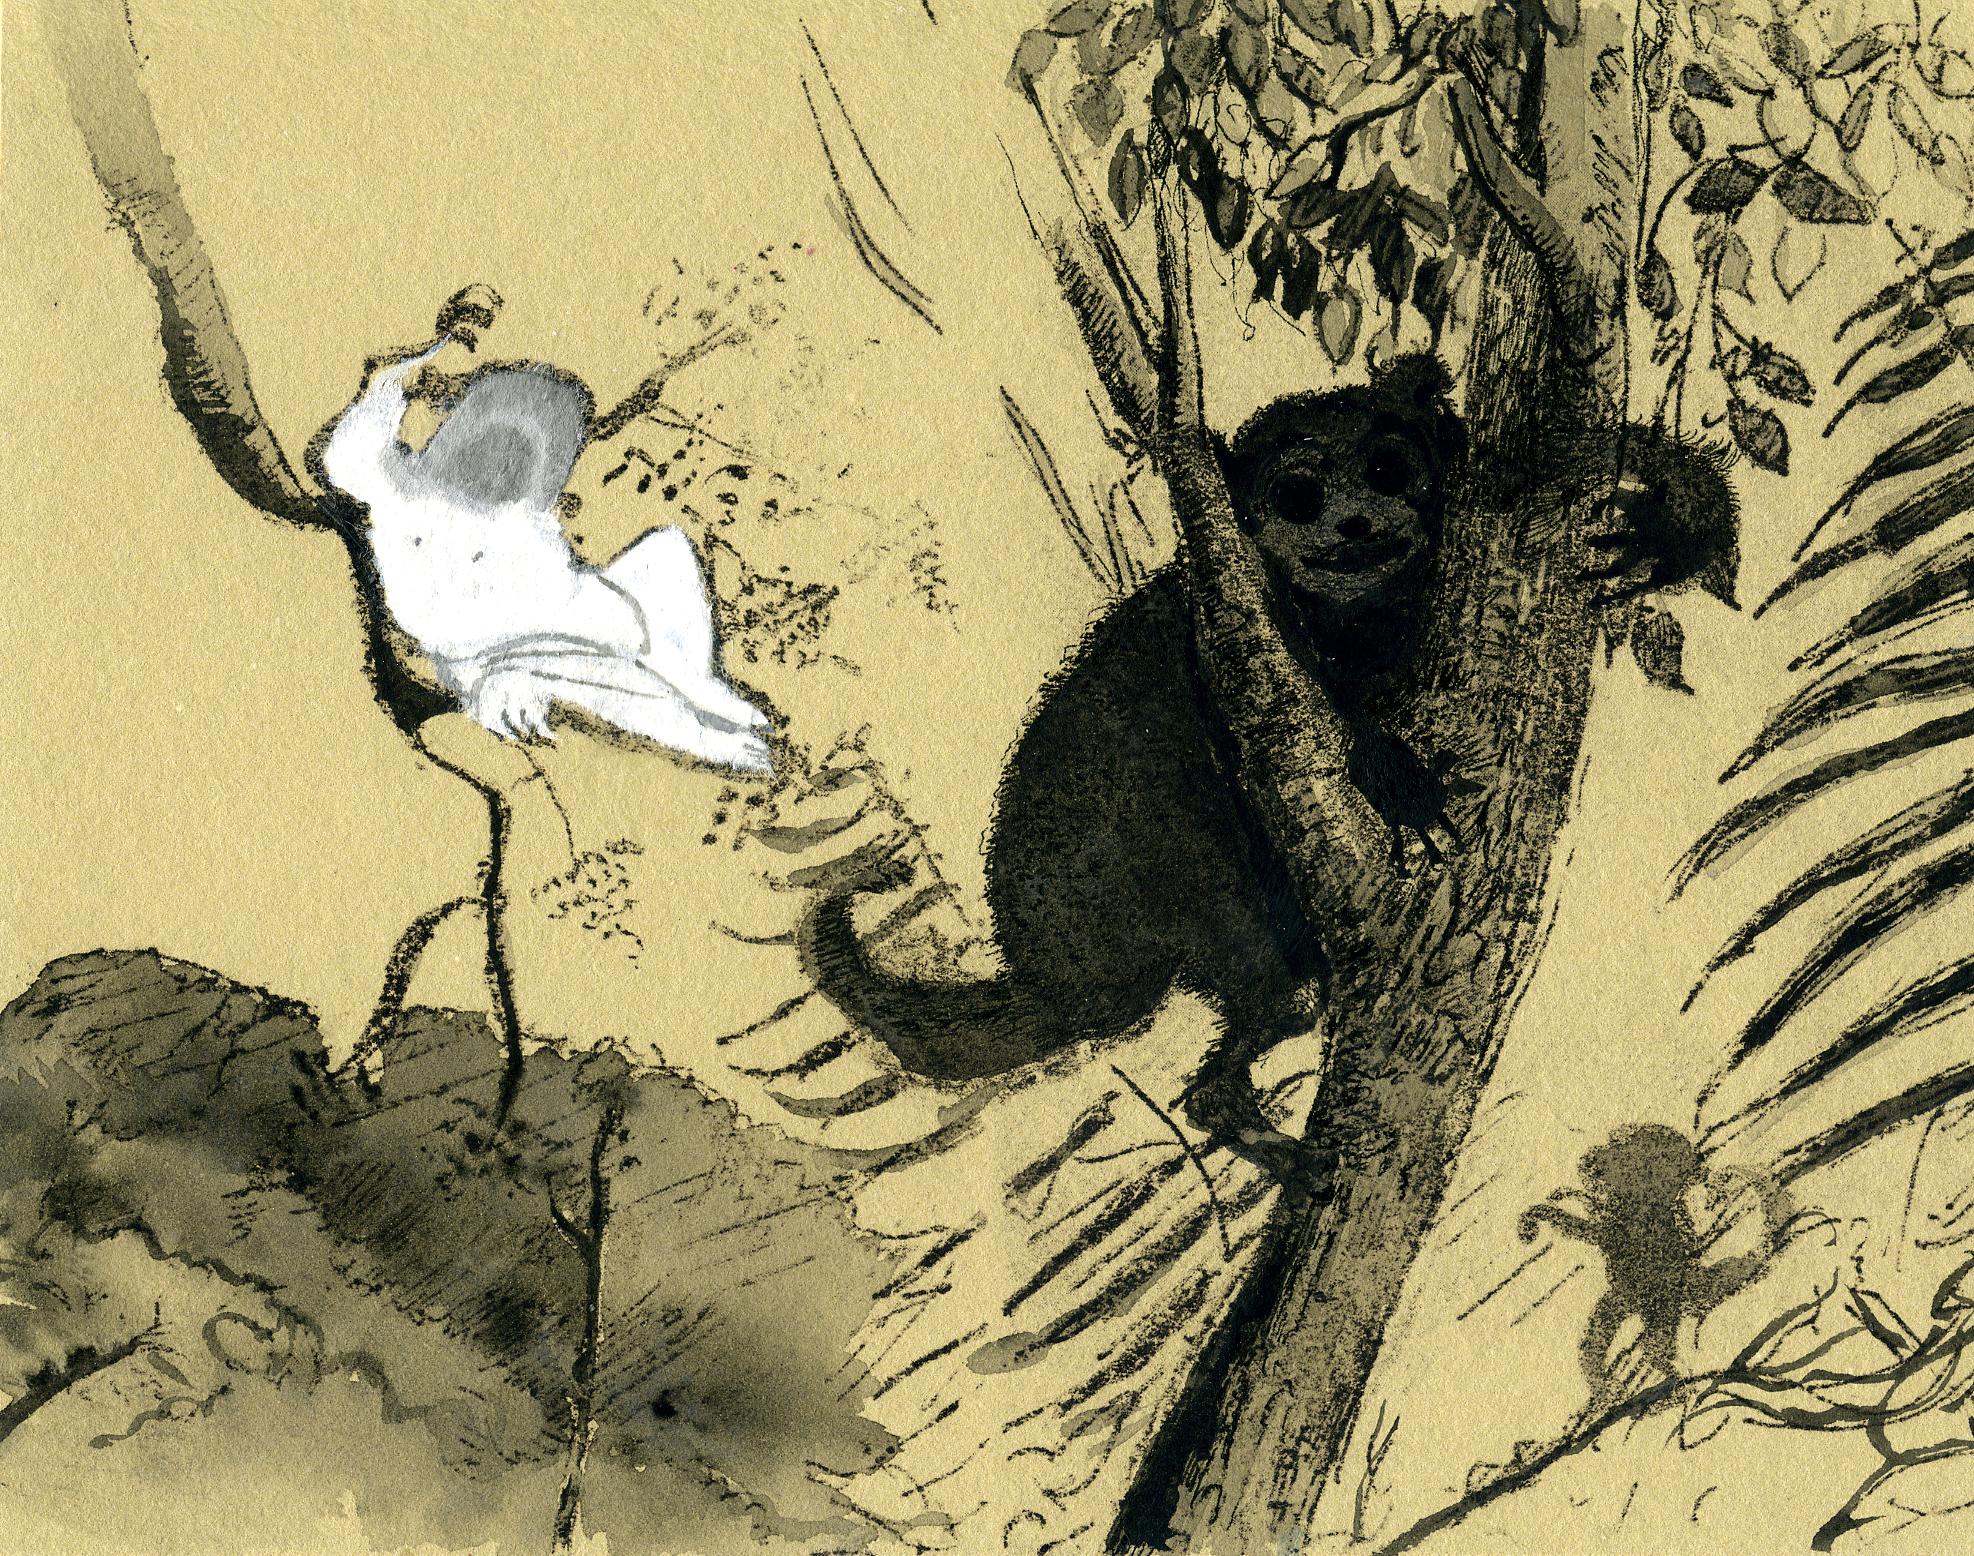 monkeys1.jpg